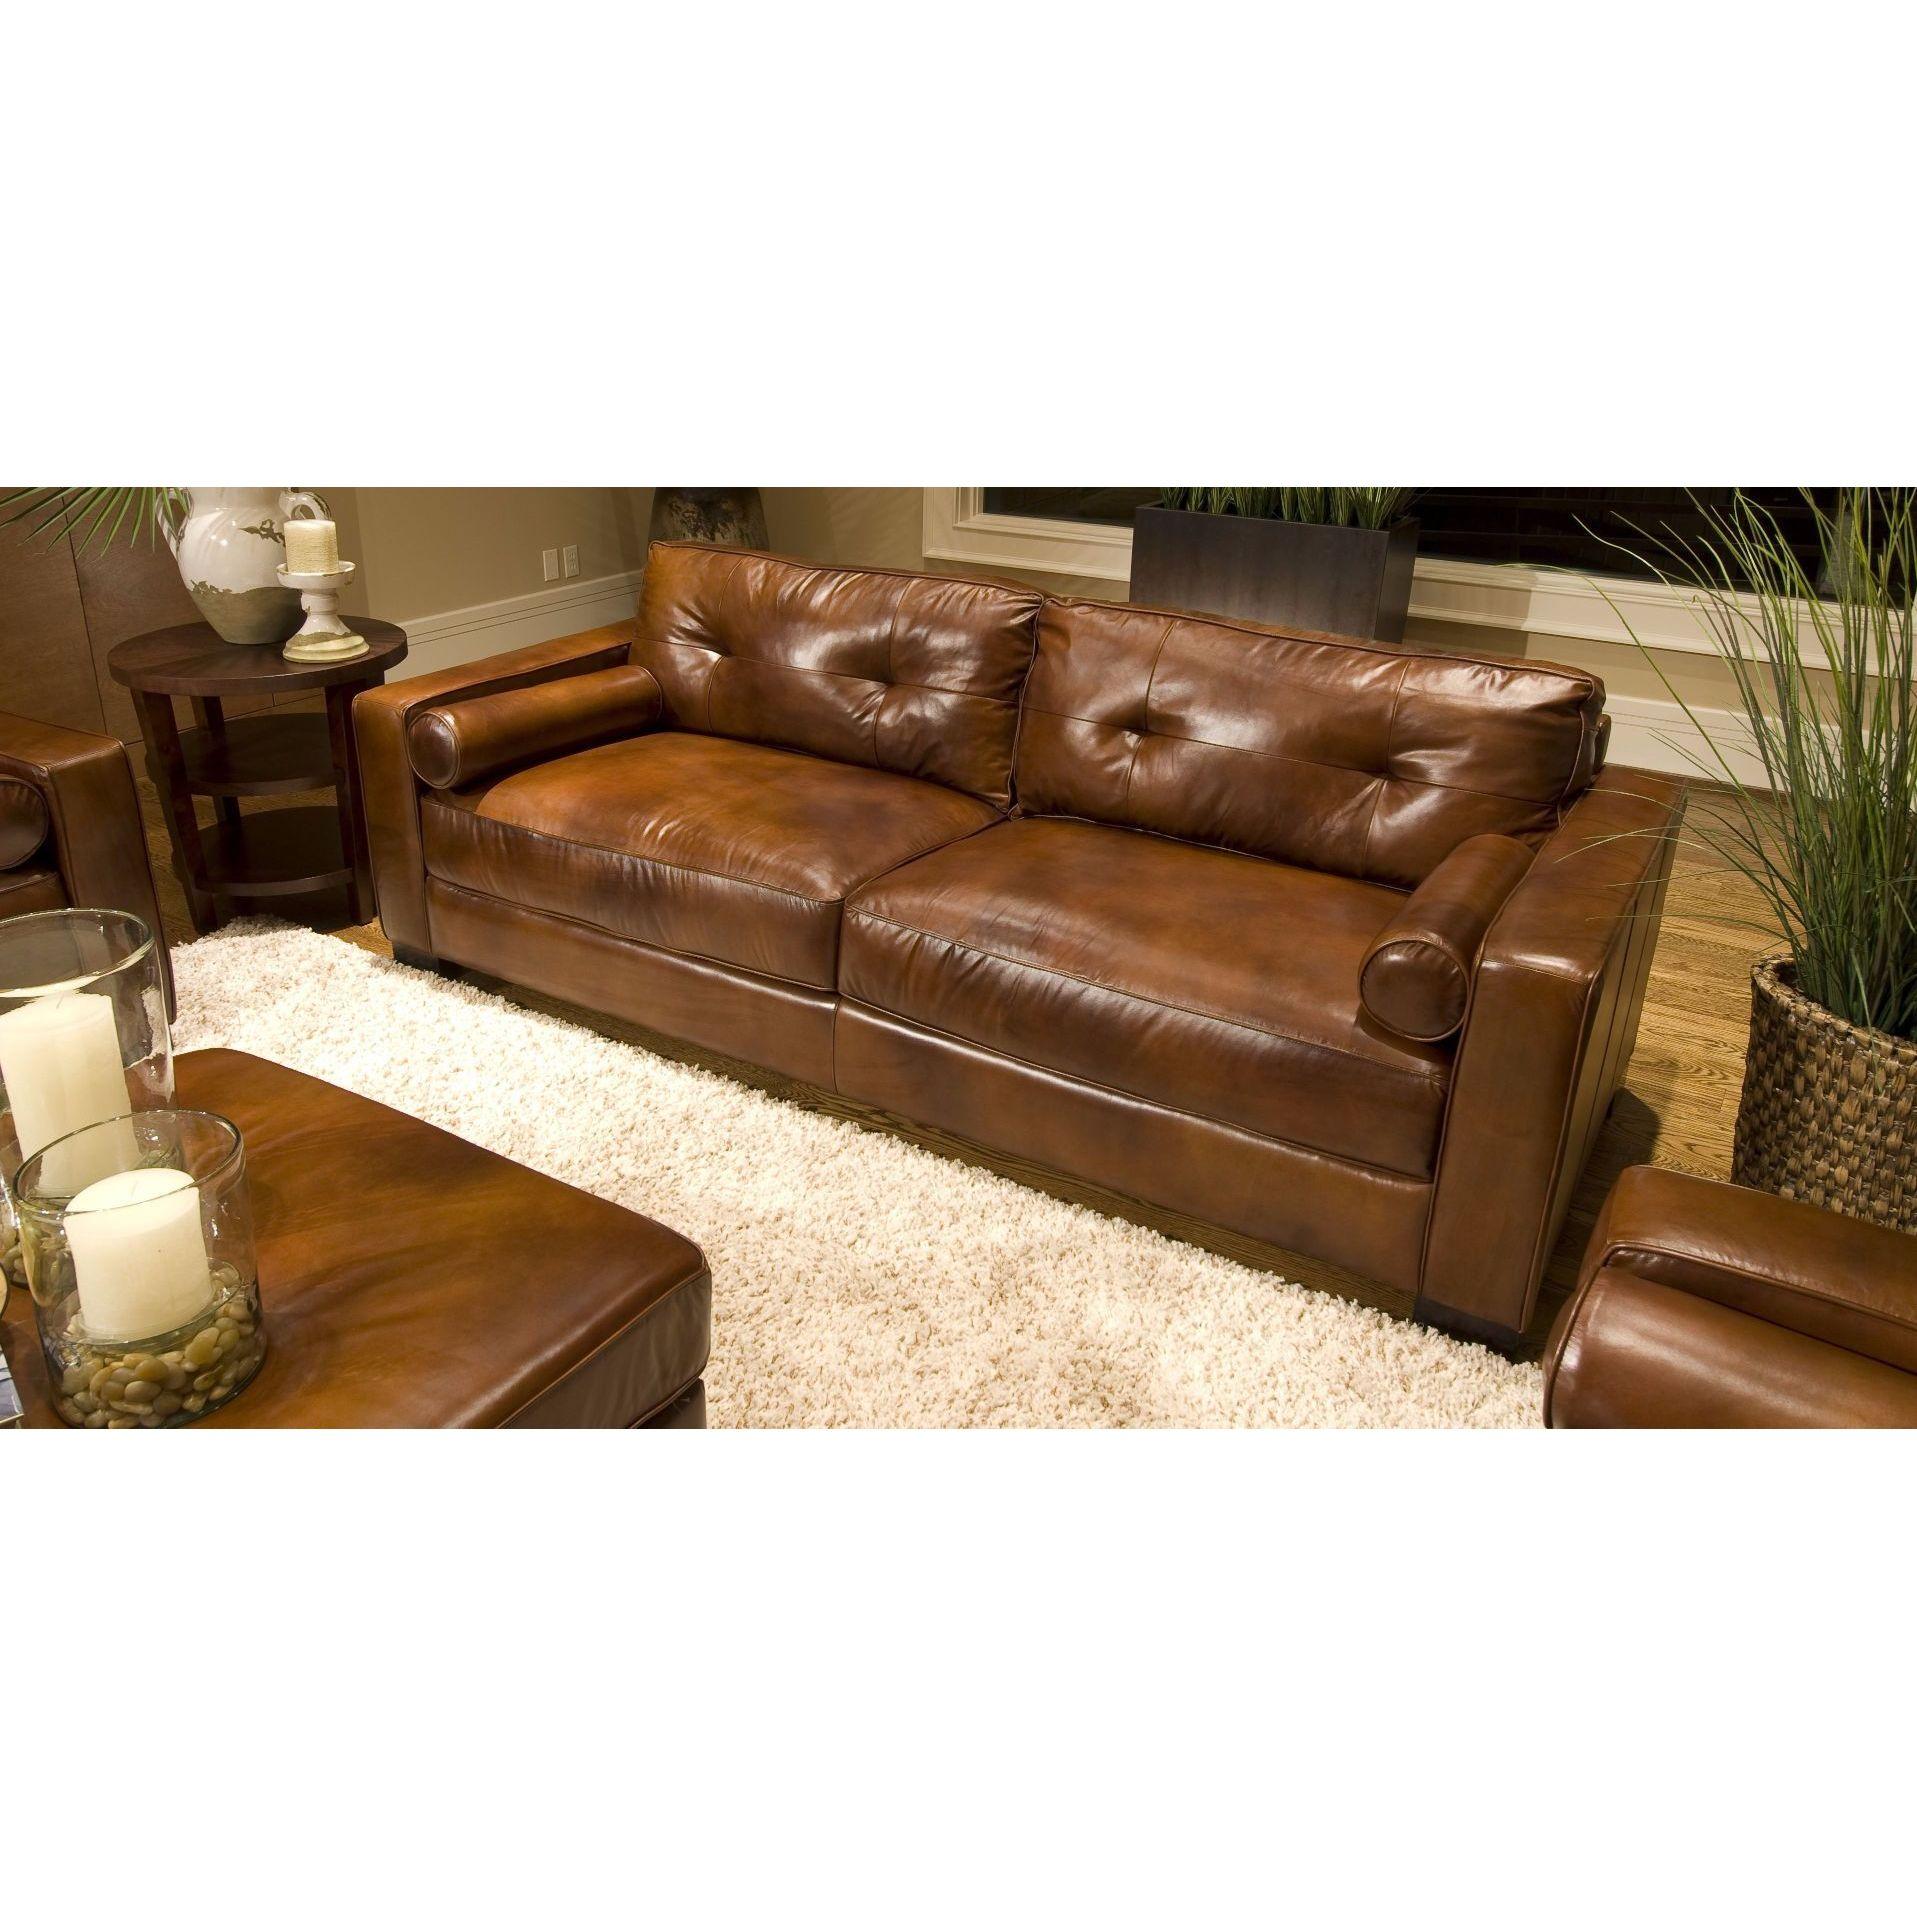 Soho Top Grain Leather Sofa In Rustic